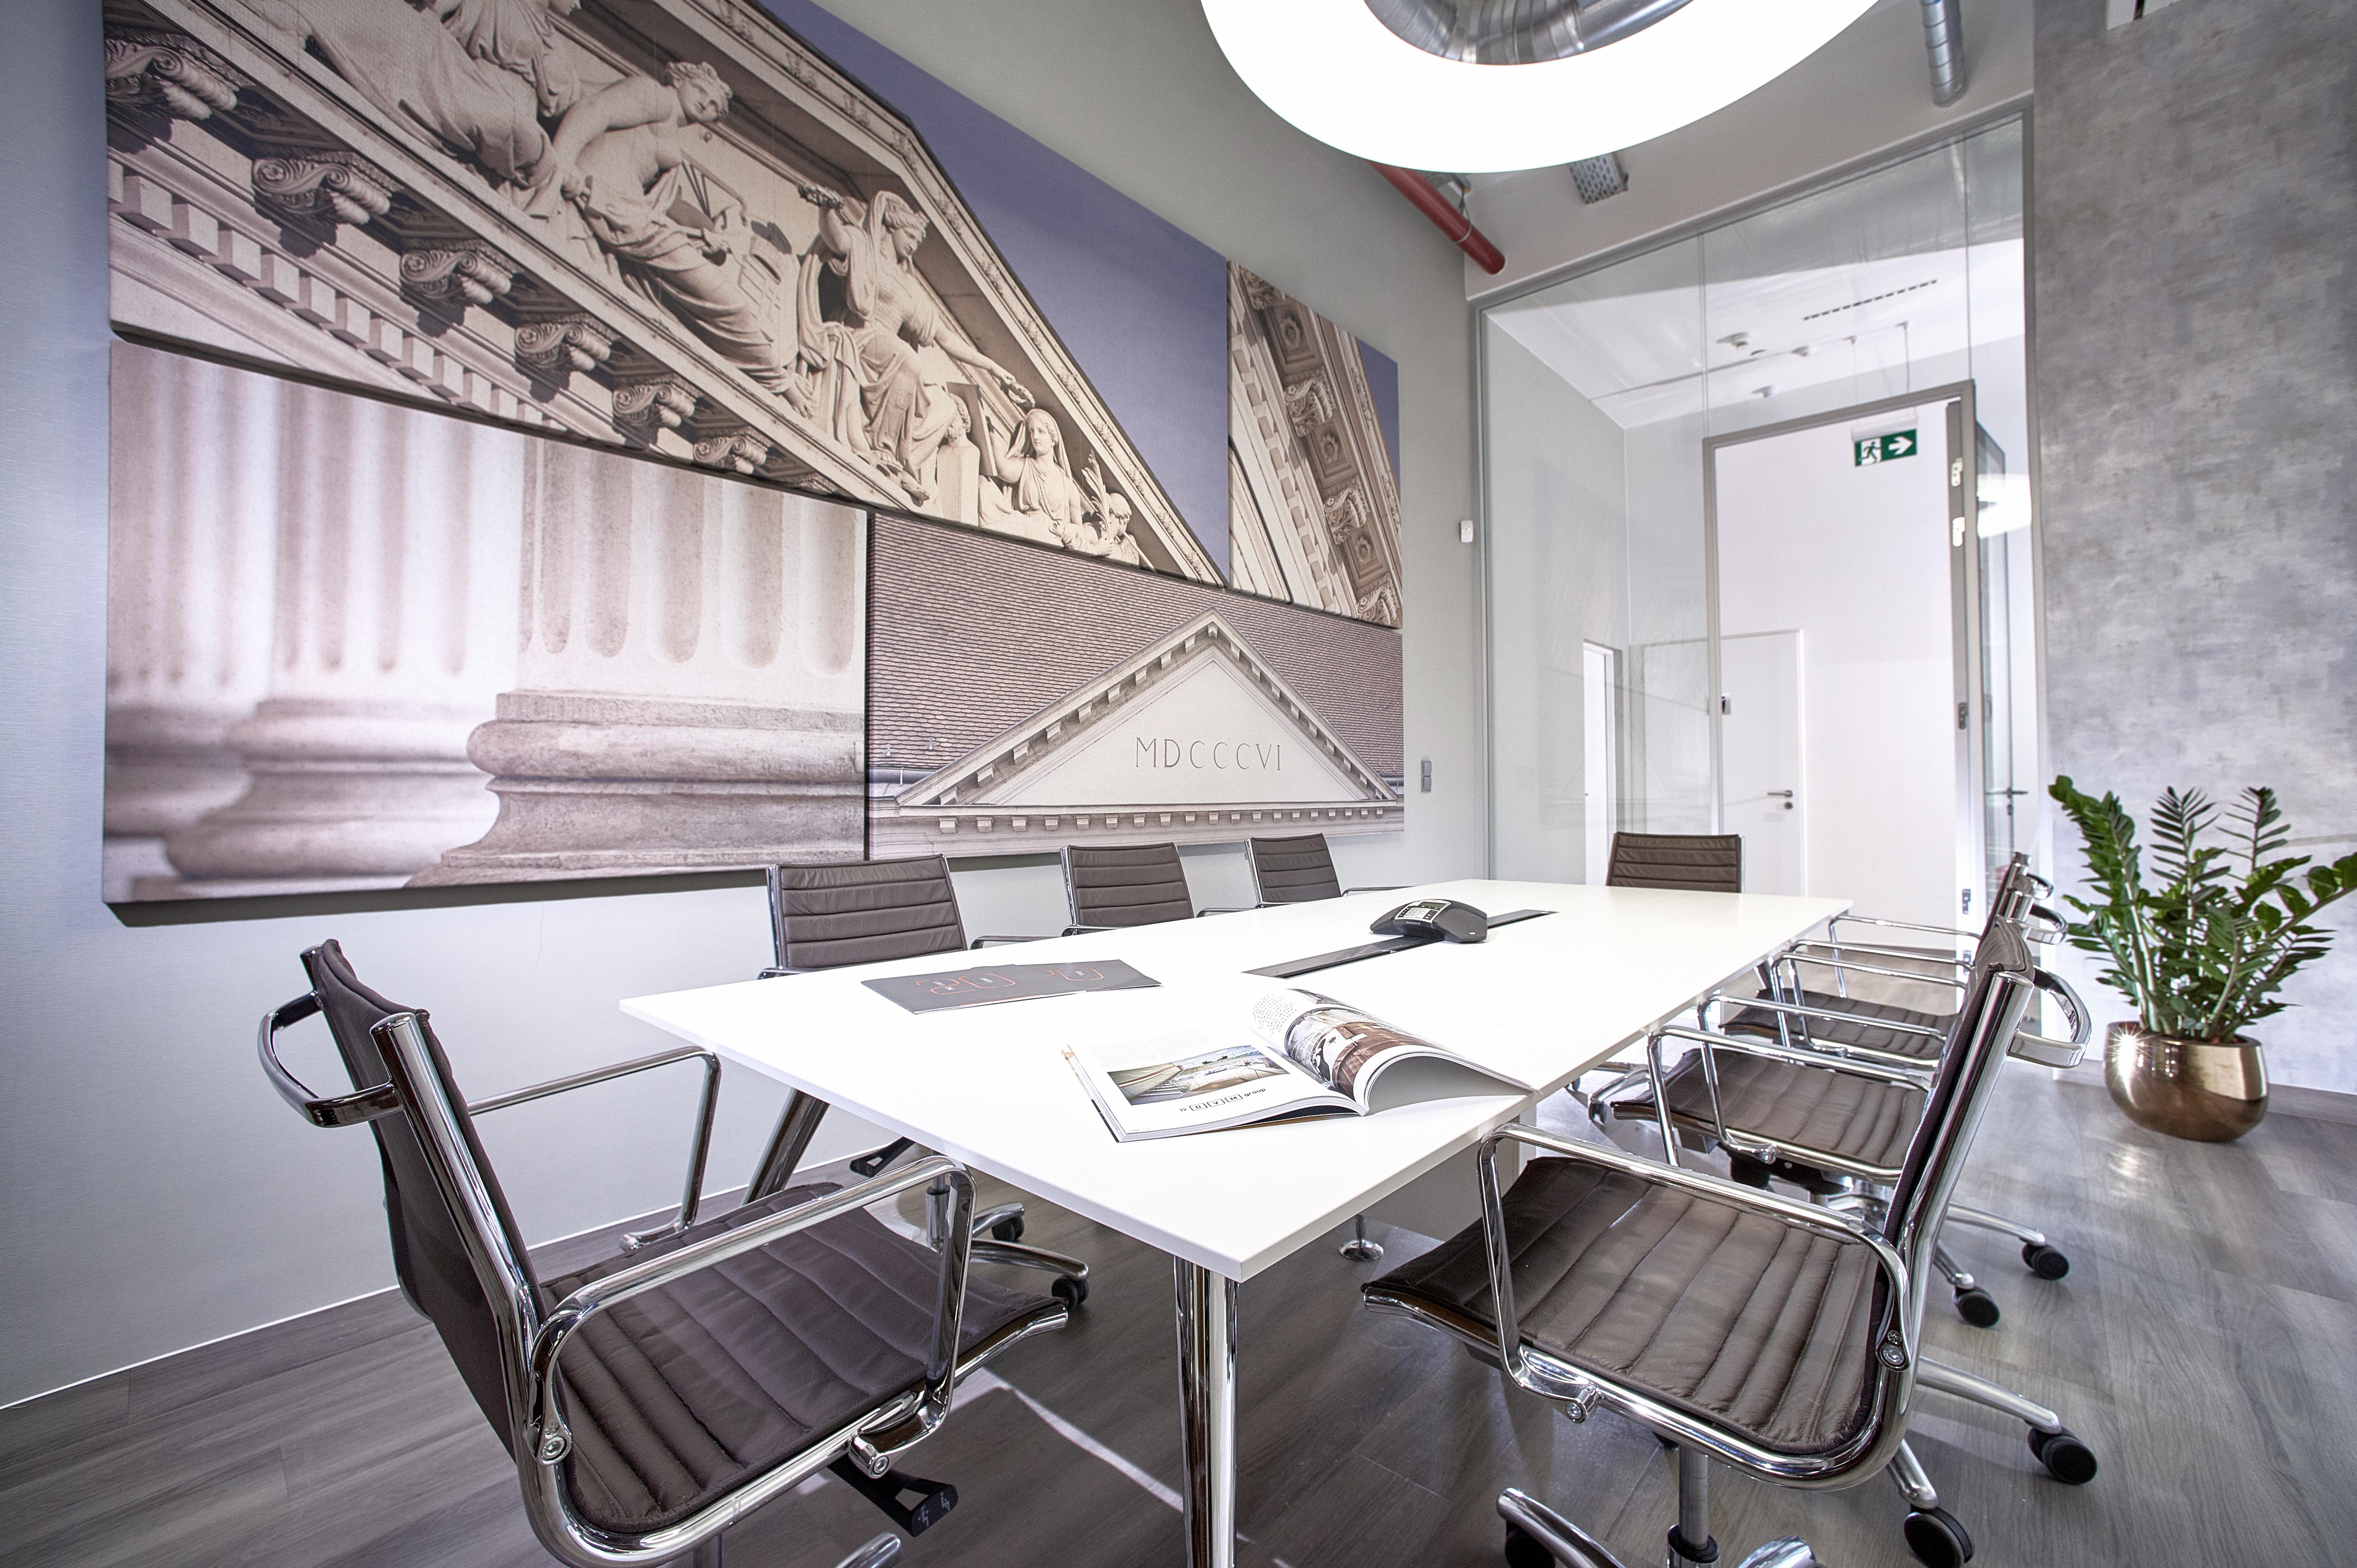 23._modern_meeting_room_on_the_office_floor_vaci1_budapest_hungary